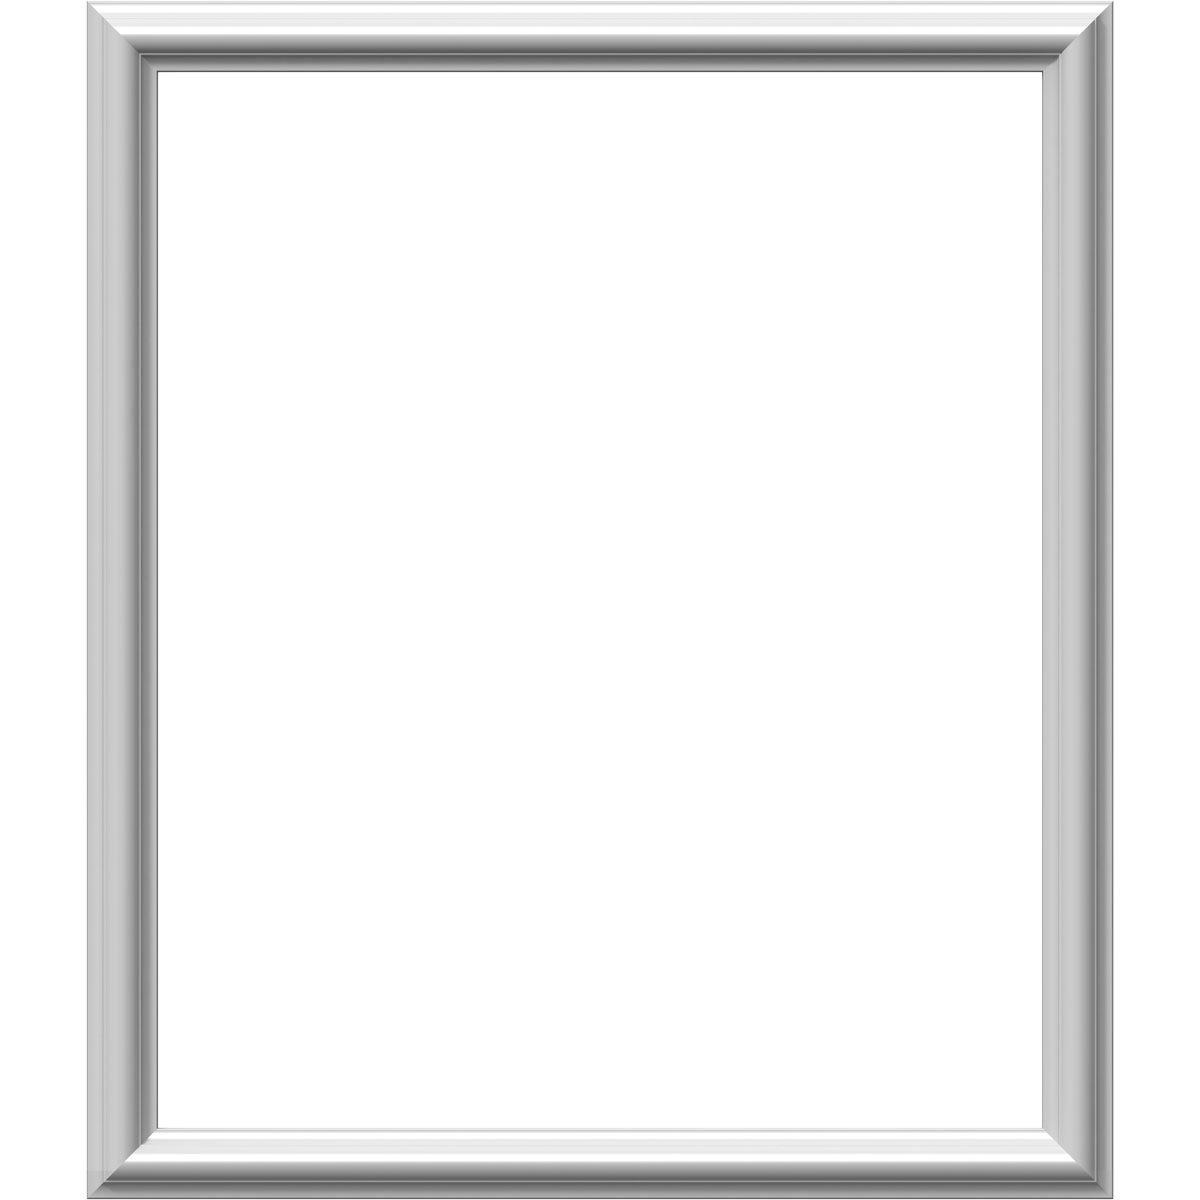 Ekena Millwork PNL24X28AS-01 24''W x 28''H x 1/2''P Ashford Molded Classic Wainscot Wall Panel